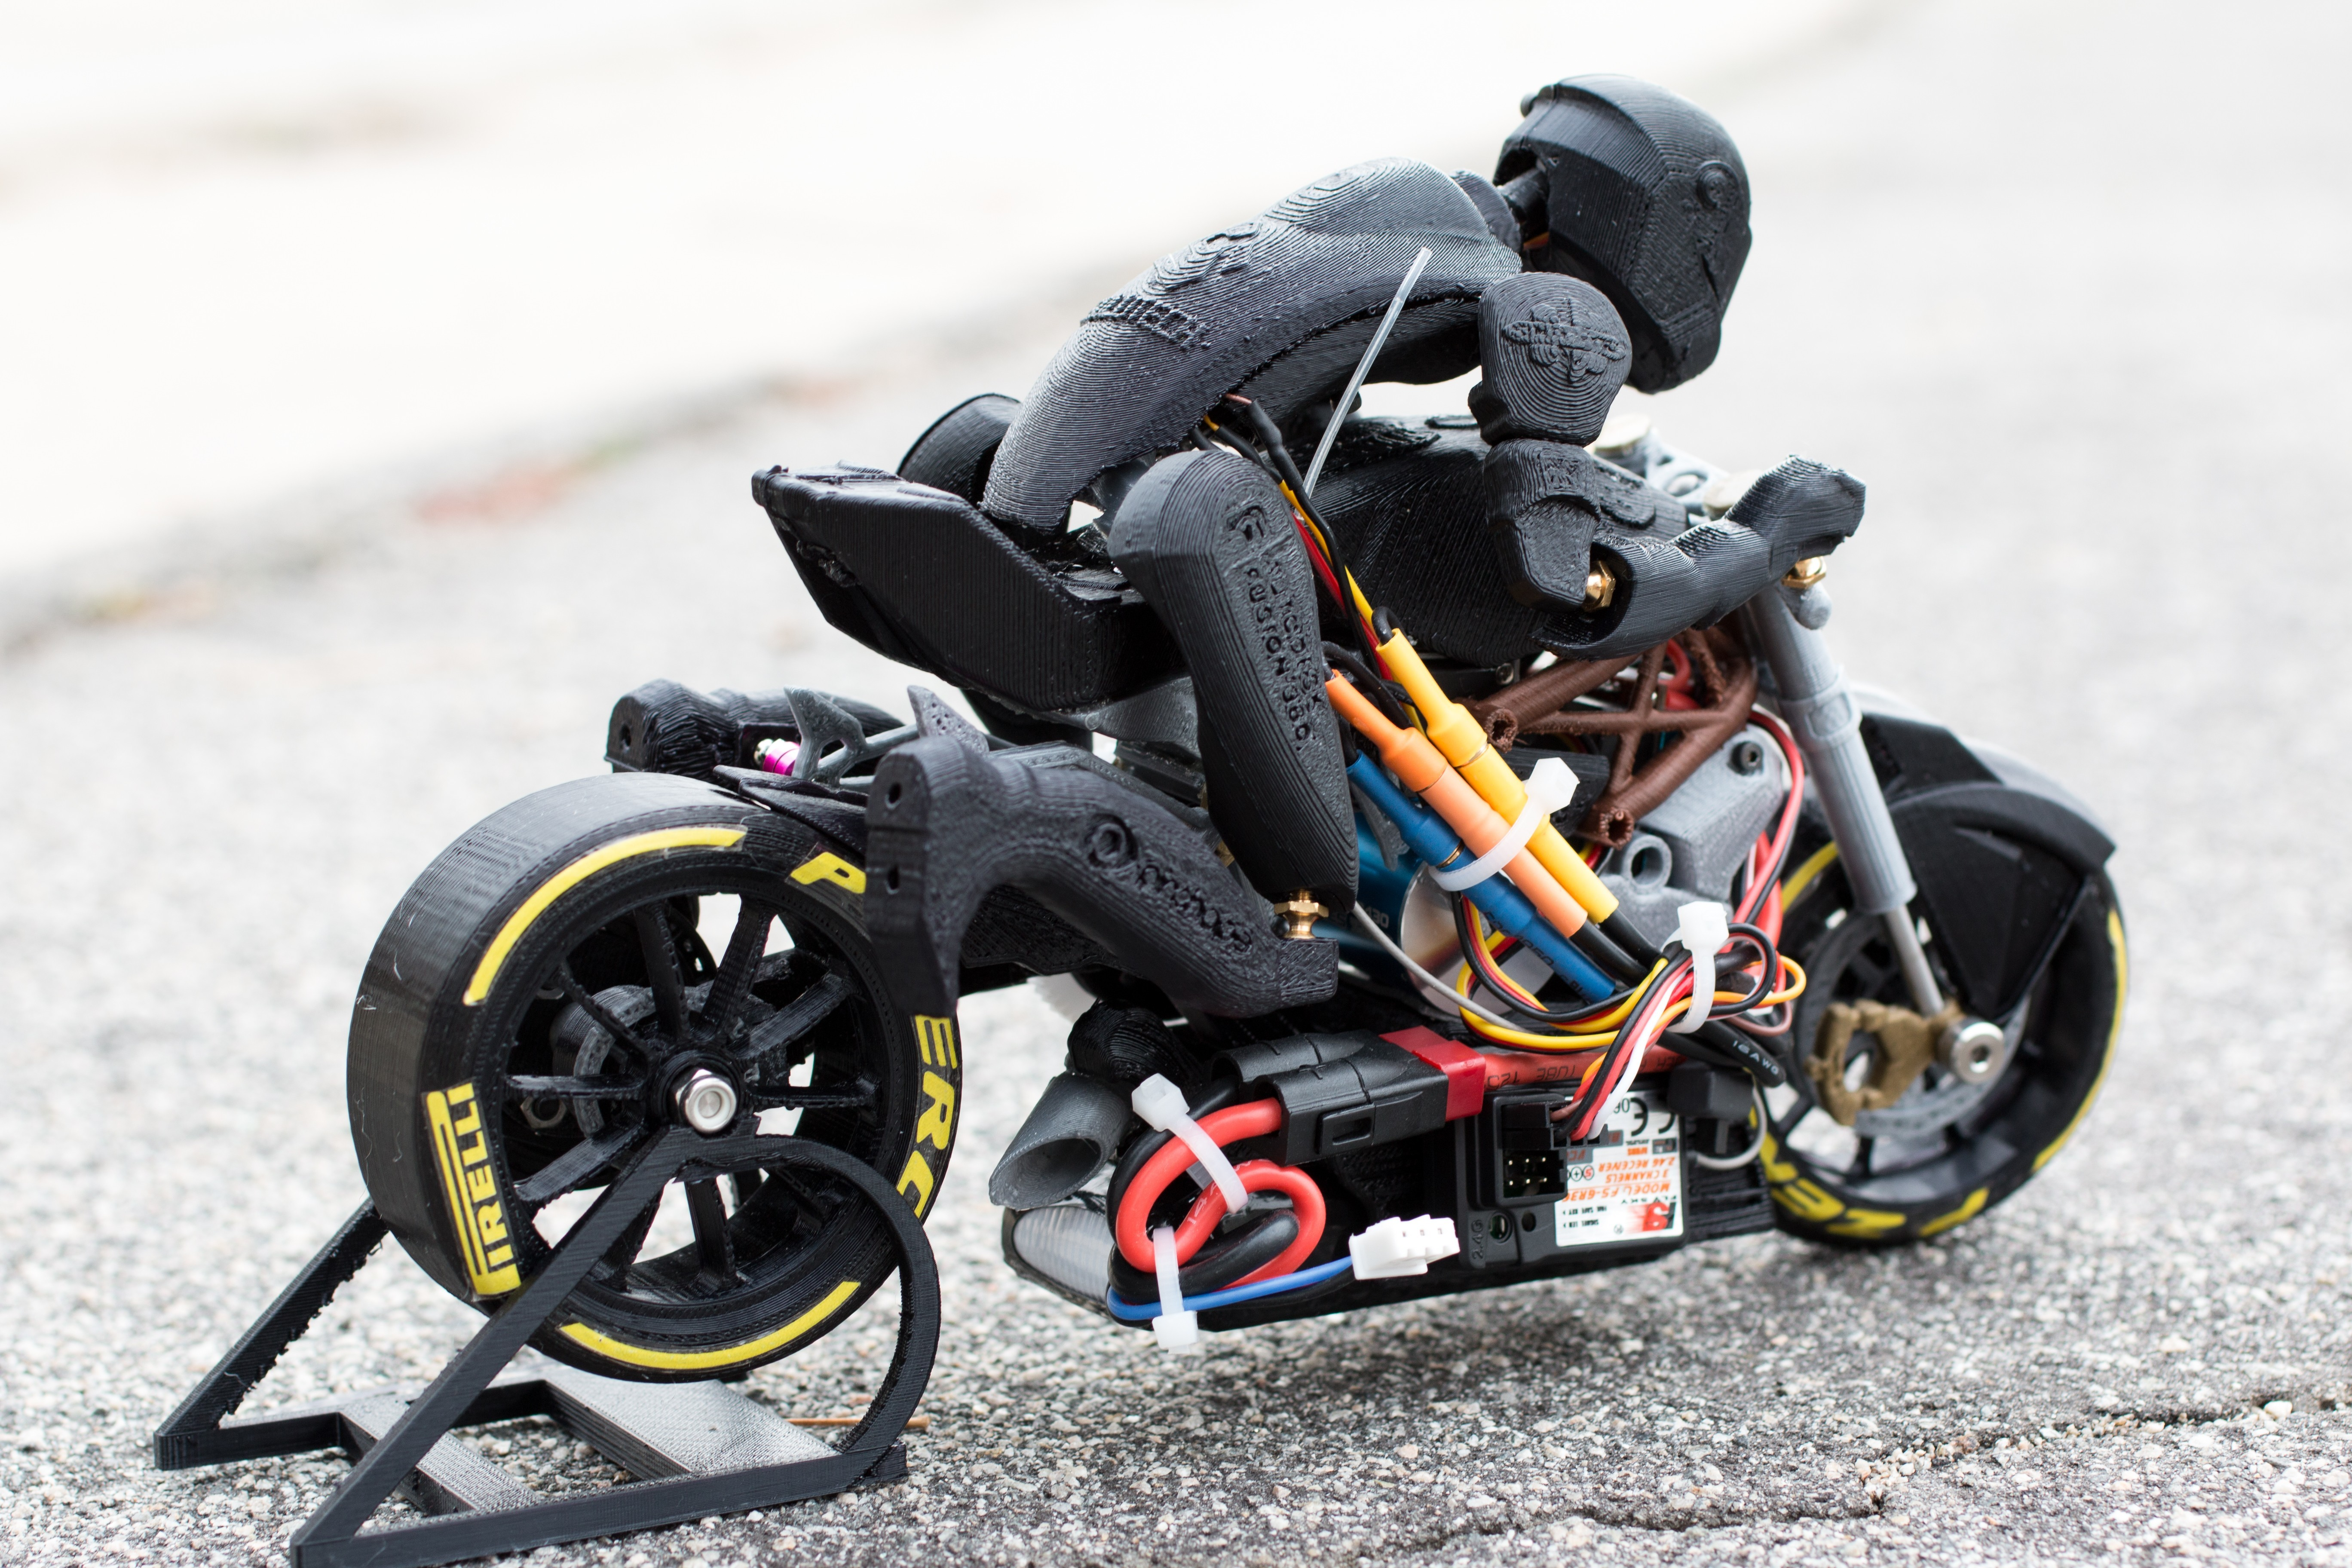 _MG_4448.jpg Download free STL file 2016 Ducati Draxter Concept Drag Bike RC • 3D printer template, brett